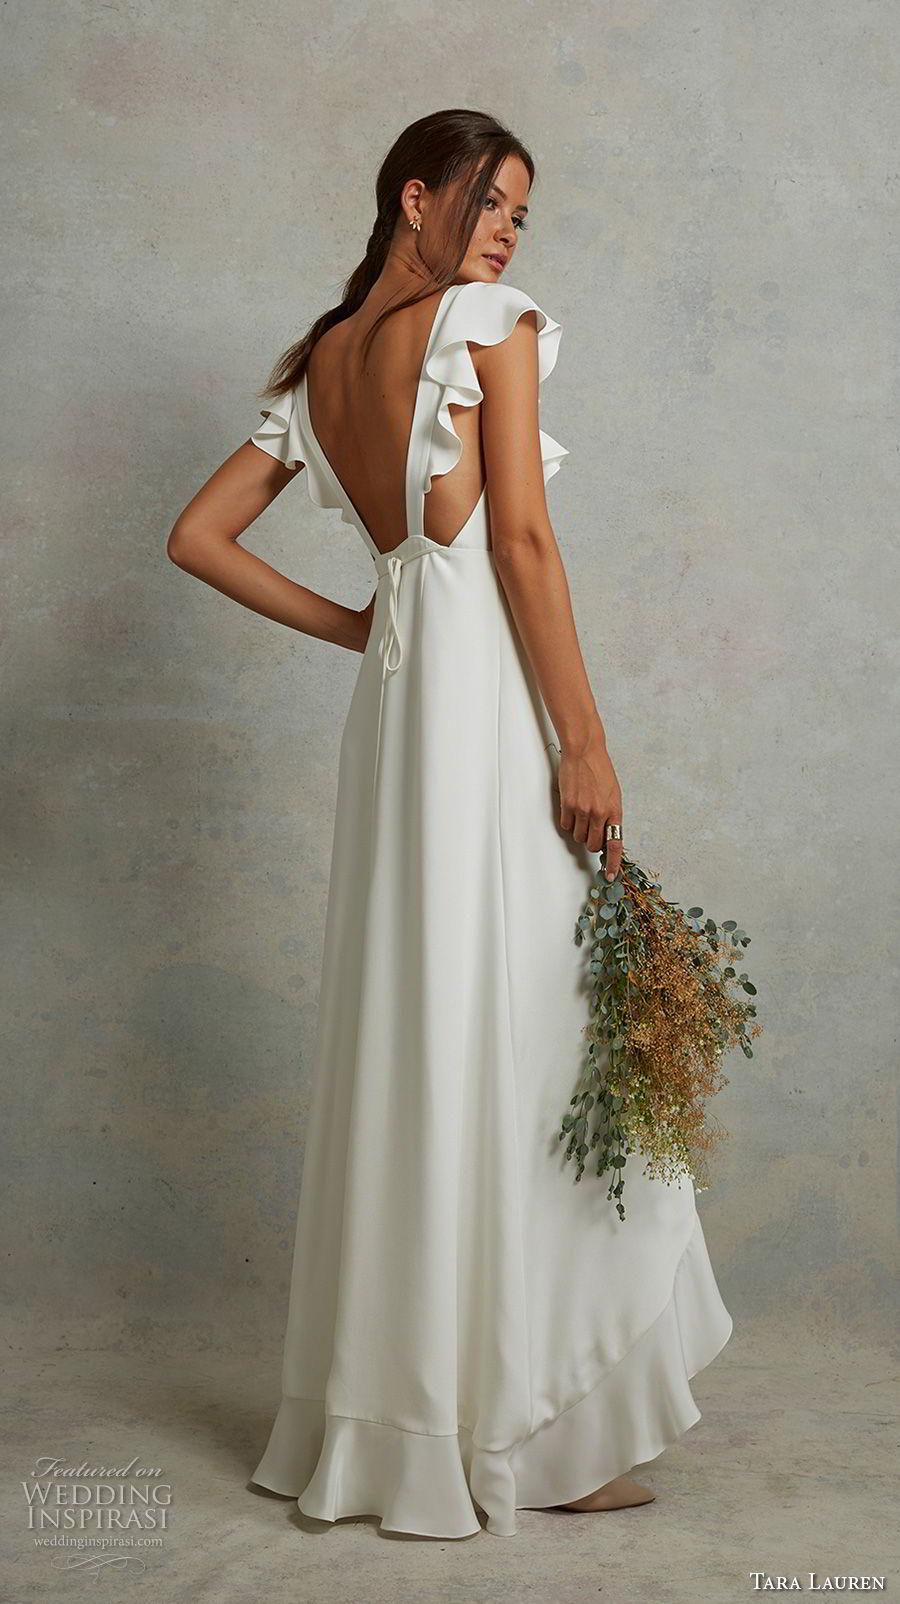 Tara lauren spring 2018 wedding dresses wedding inspirasi for Butterfly back wedding dress